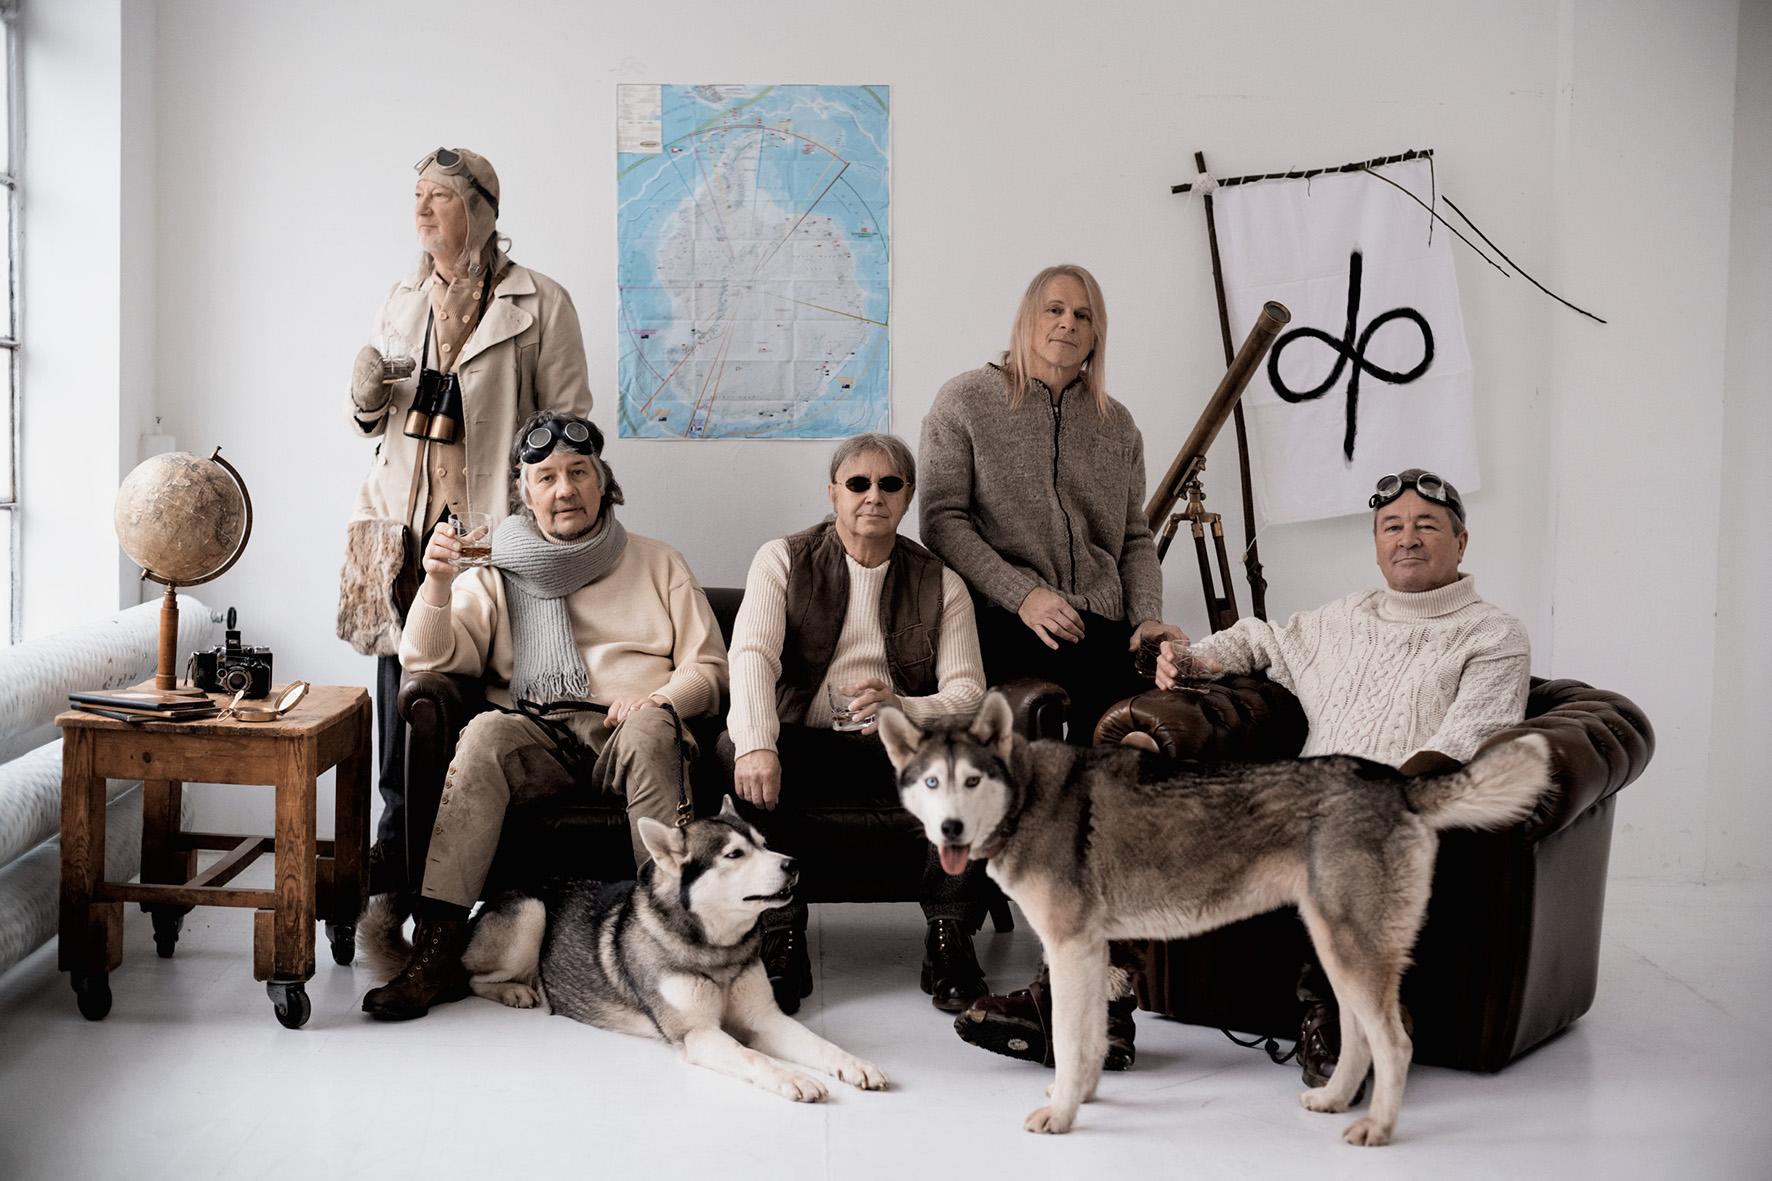 Deep Purple: Roger Glover (from left), Don Airey, Ian Paice, Steve Morse and Ian Gillan.